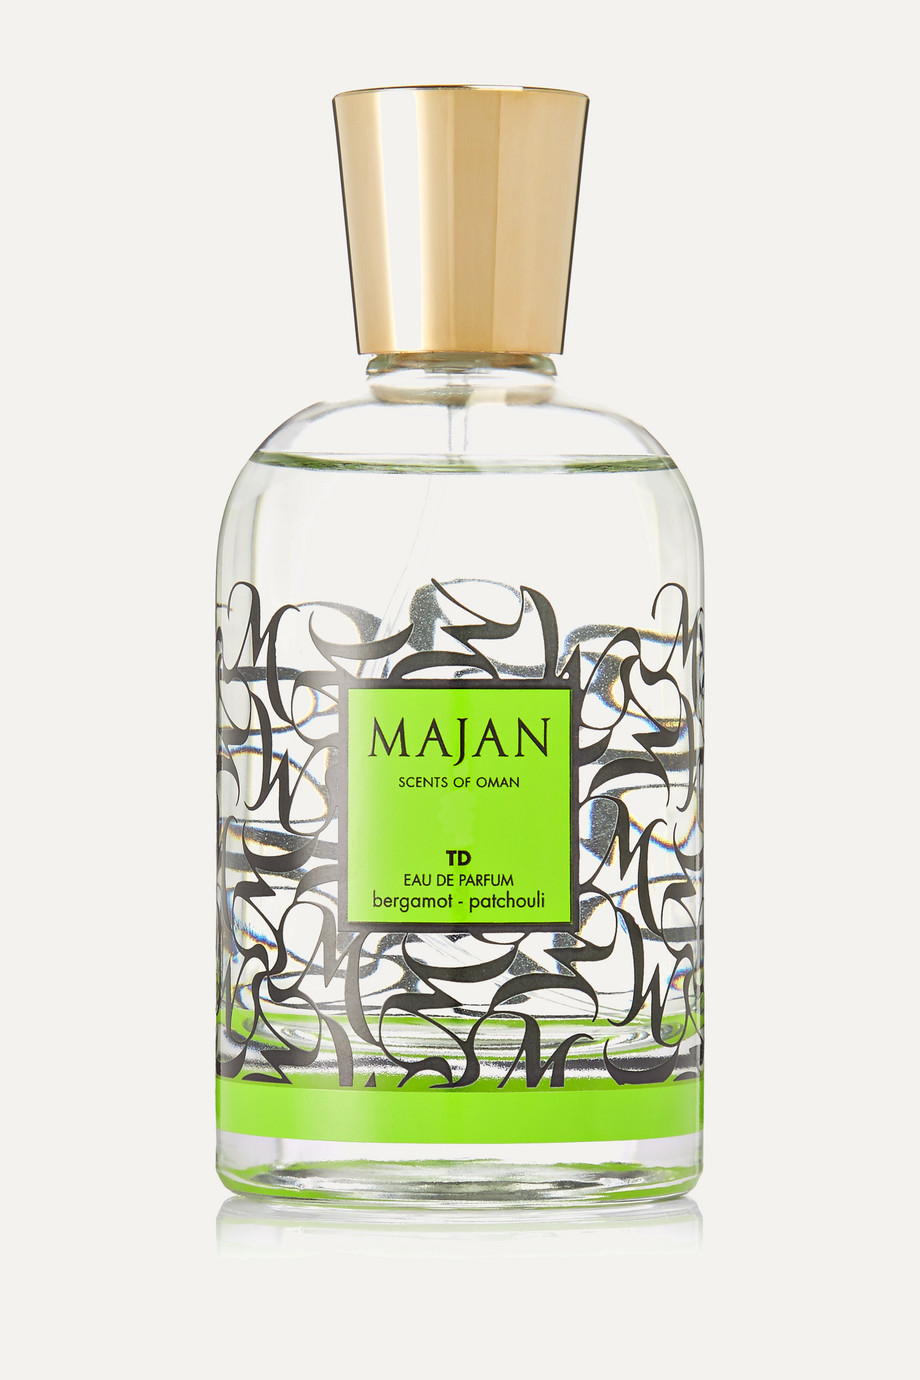 MAJAN TD, 100 ml – Eau de Parfum